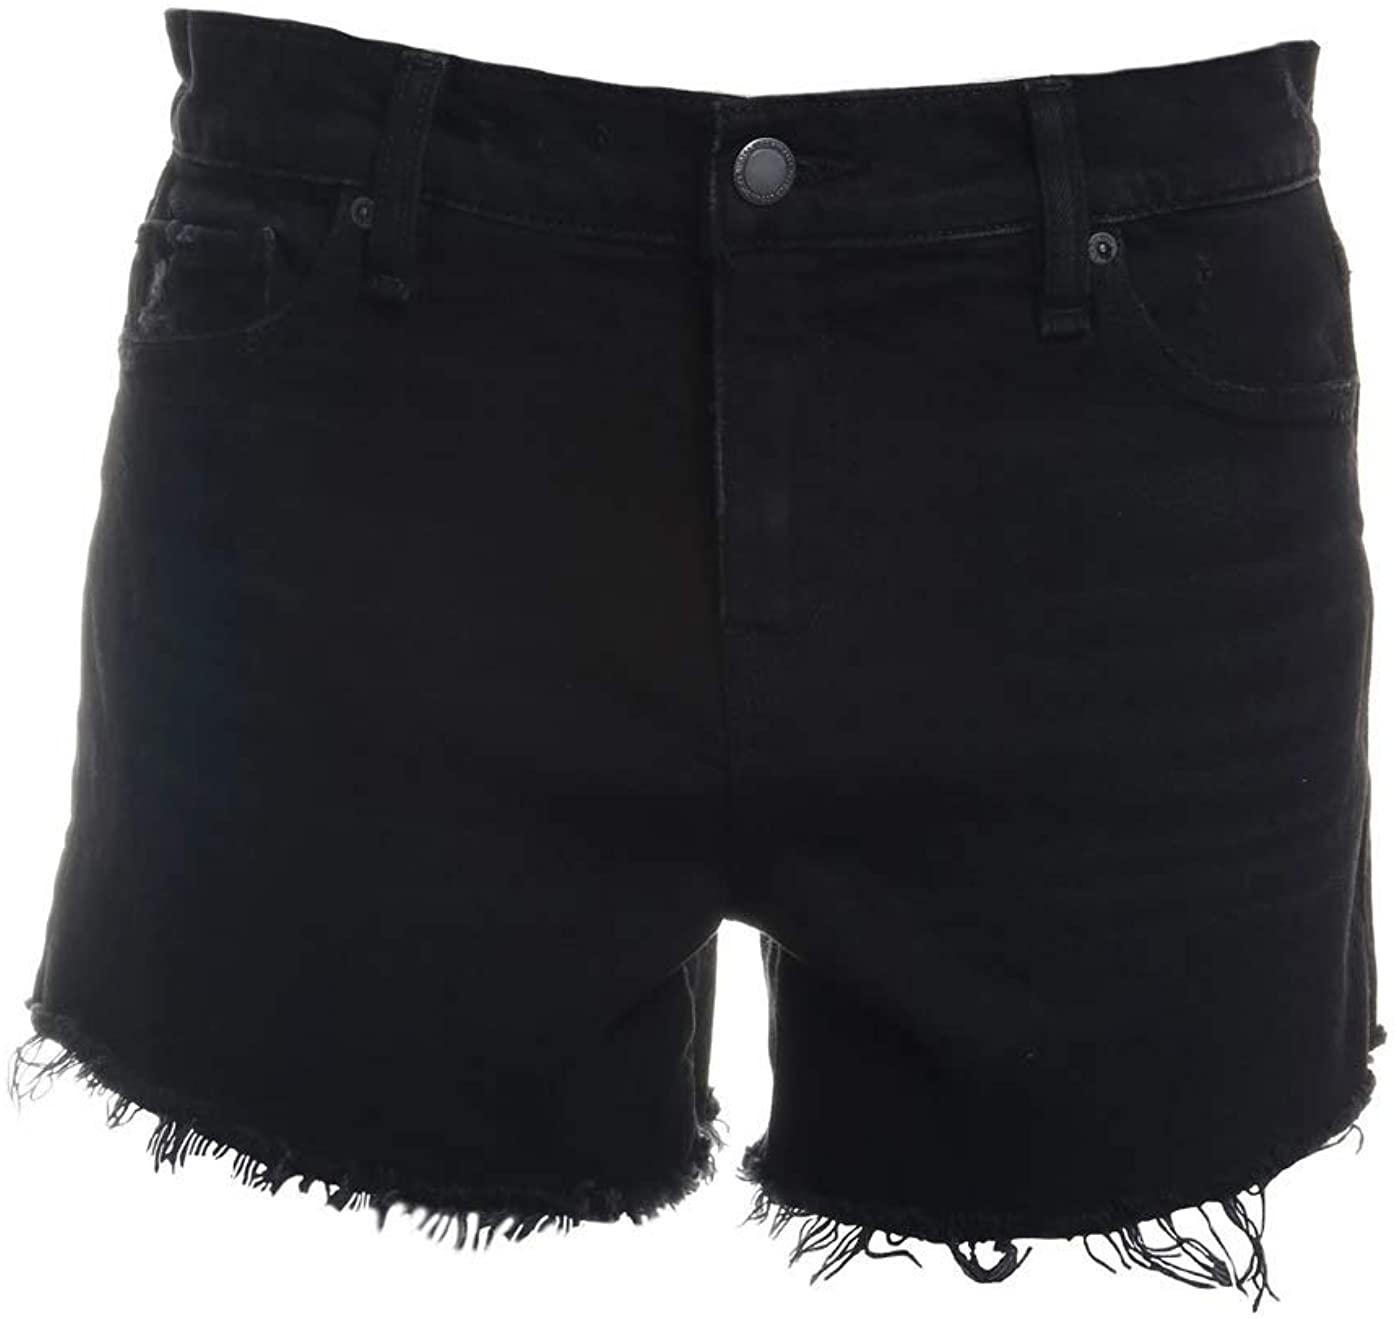 Hudson Jeans Gemma Mid-Rise Cut Off Shorts in Blitz Destructed